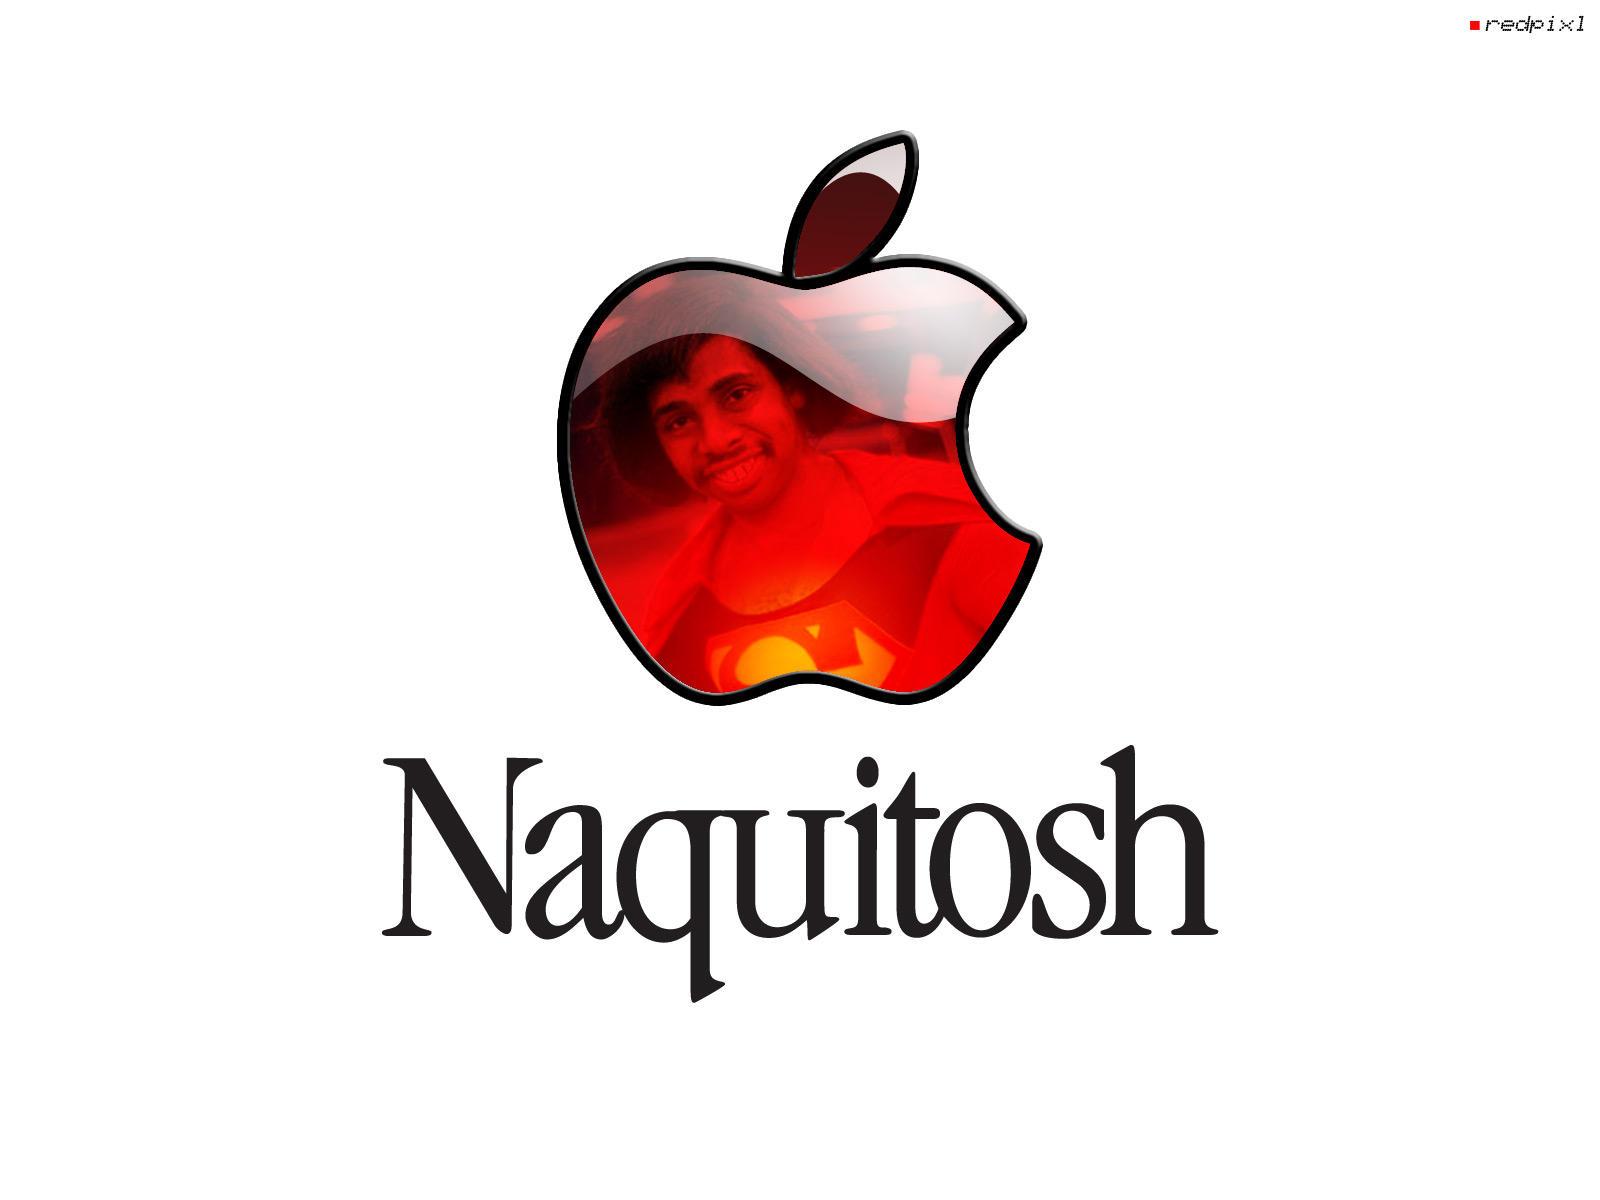 :: Naquintosh :: by redpixl